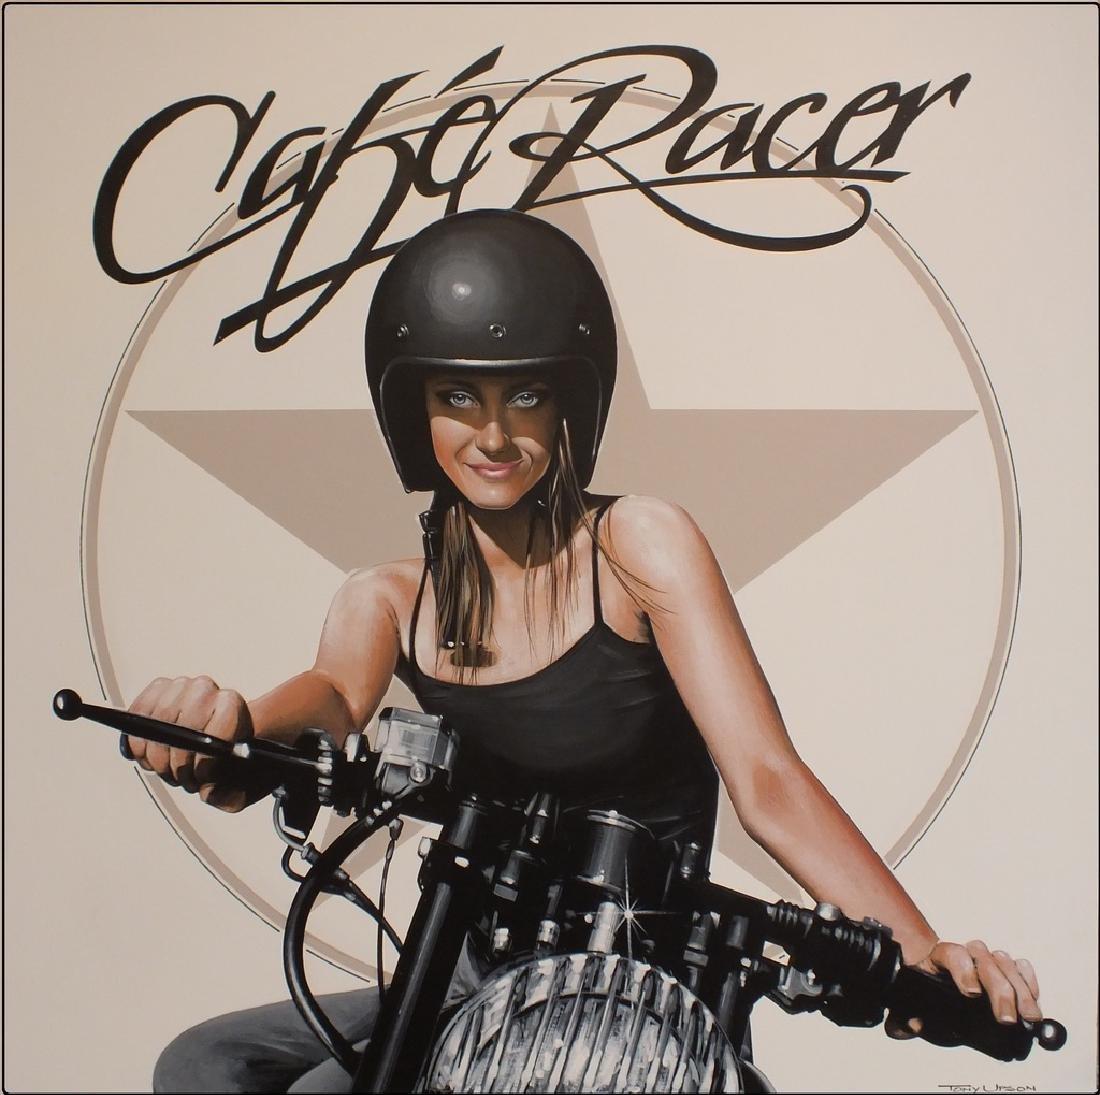 """Cafe Racer"", by Tony Upson."